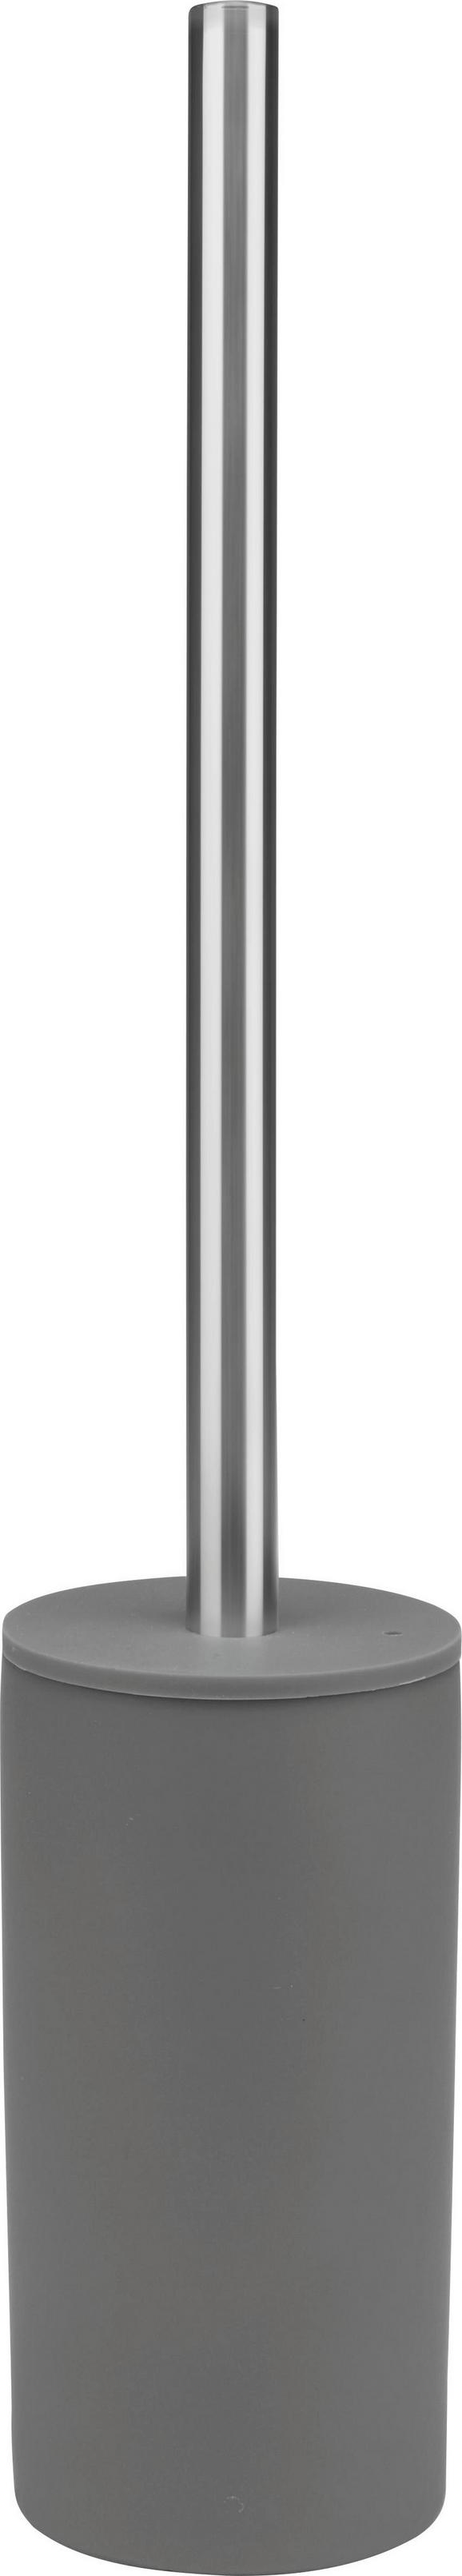 WC-Bürste Melanie in Anthrazit - KONVENTIONELL, Kunststoff/Metall (8/45cm) - MÖMAX modern living